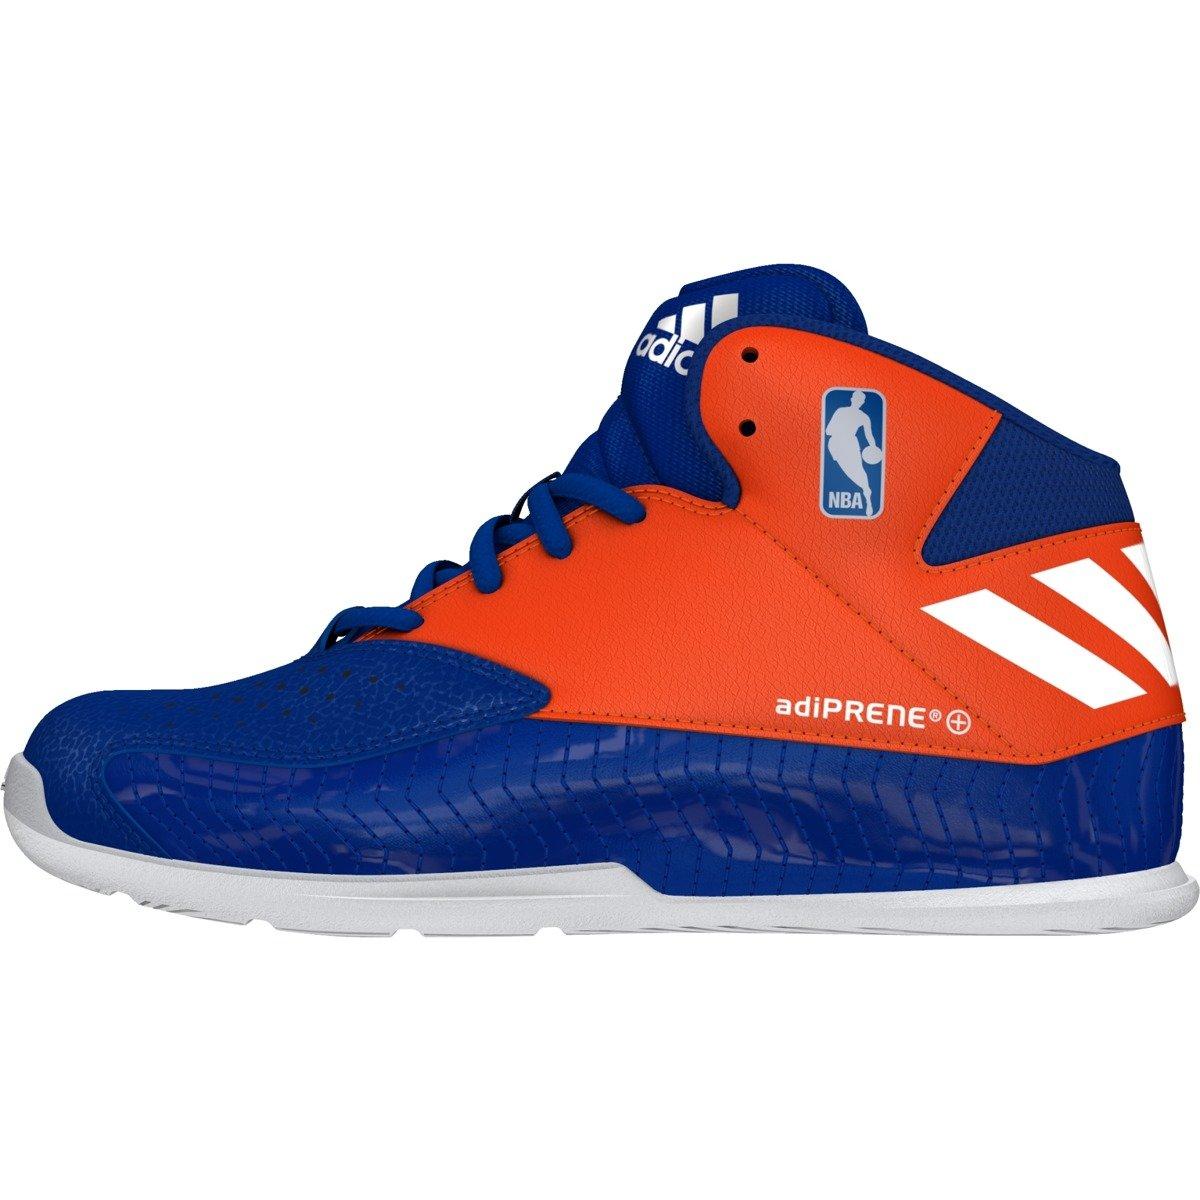 Speed BW0501 Adidas NBA 5 Next Chaussures Level 4FxPwA0Sq1